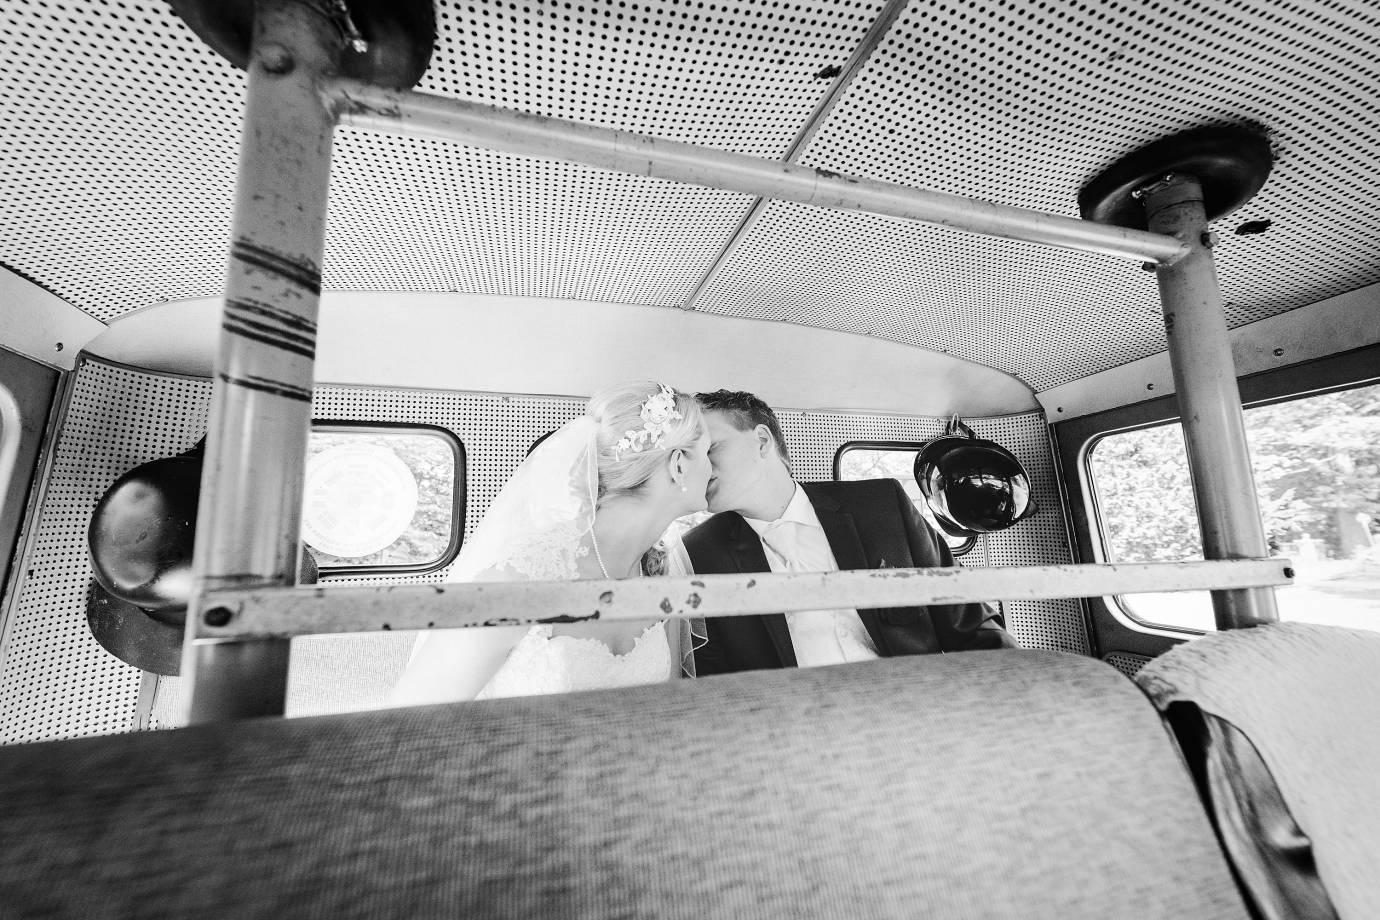 hochzeitsfotograf zeven 023 - Susann+Sören